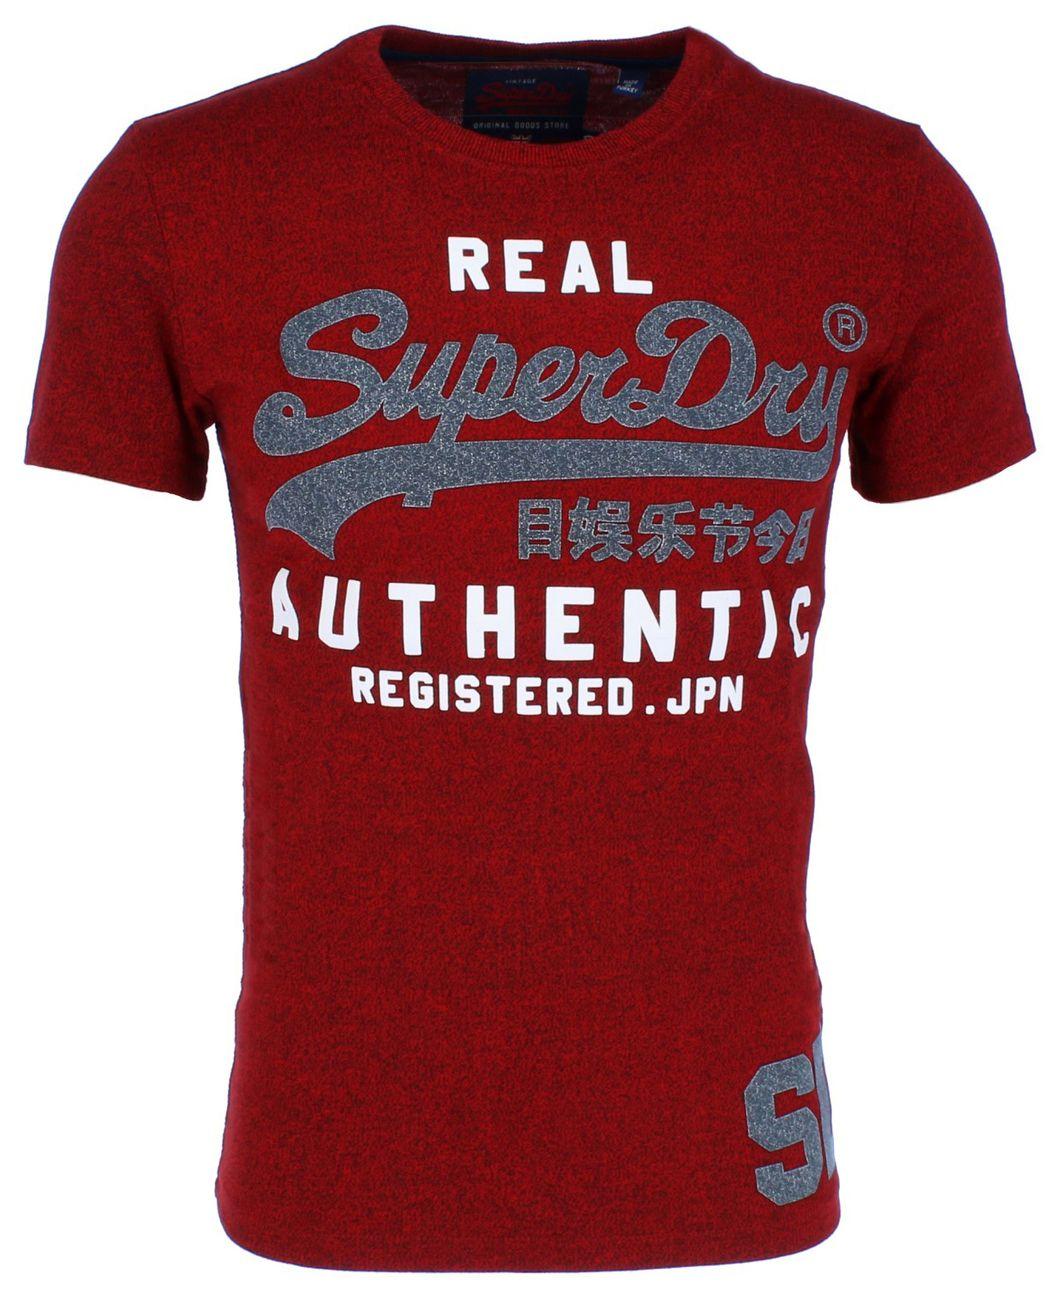 brand new 2fb65 c5f25 Details about Superdry Mens T-Shirts S - 3XL- show original title